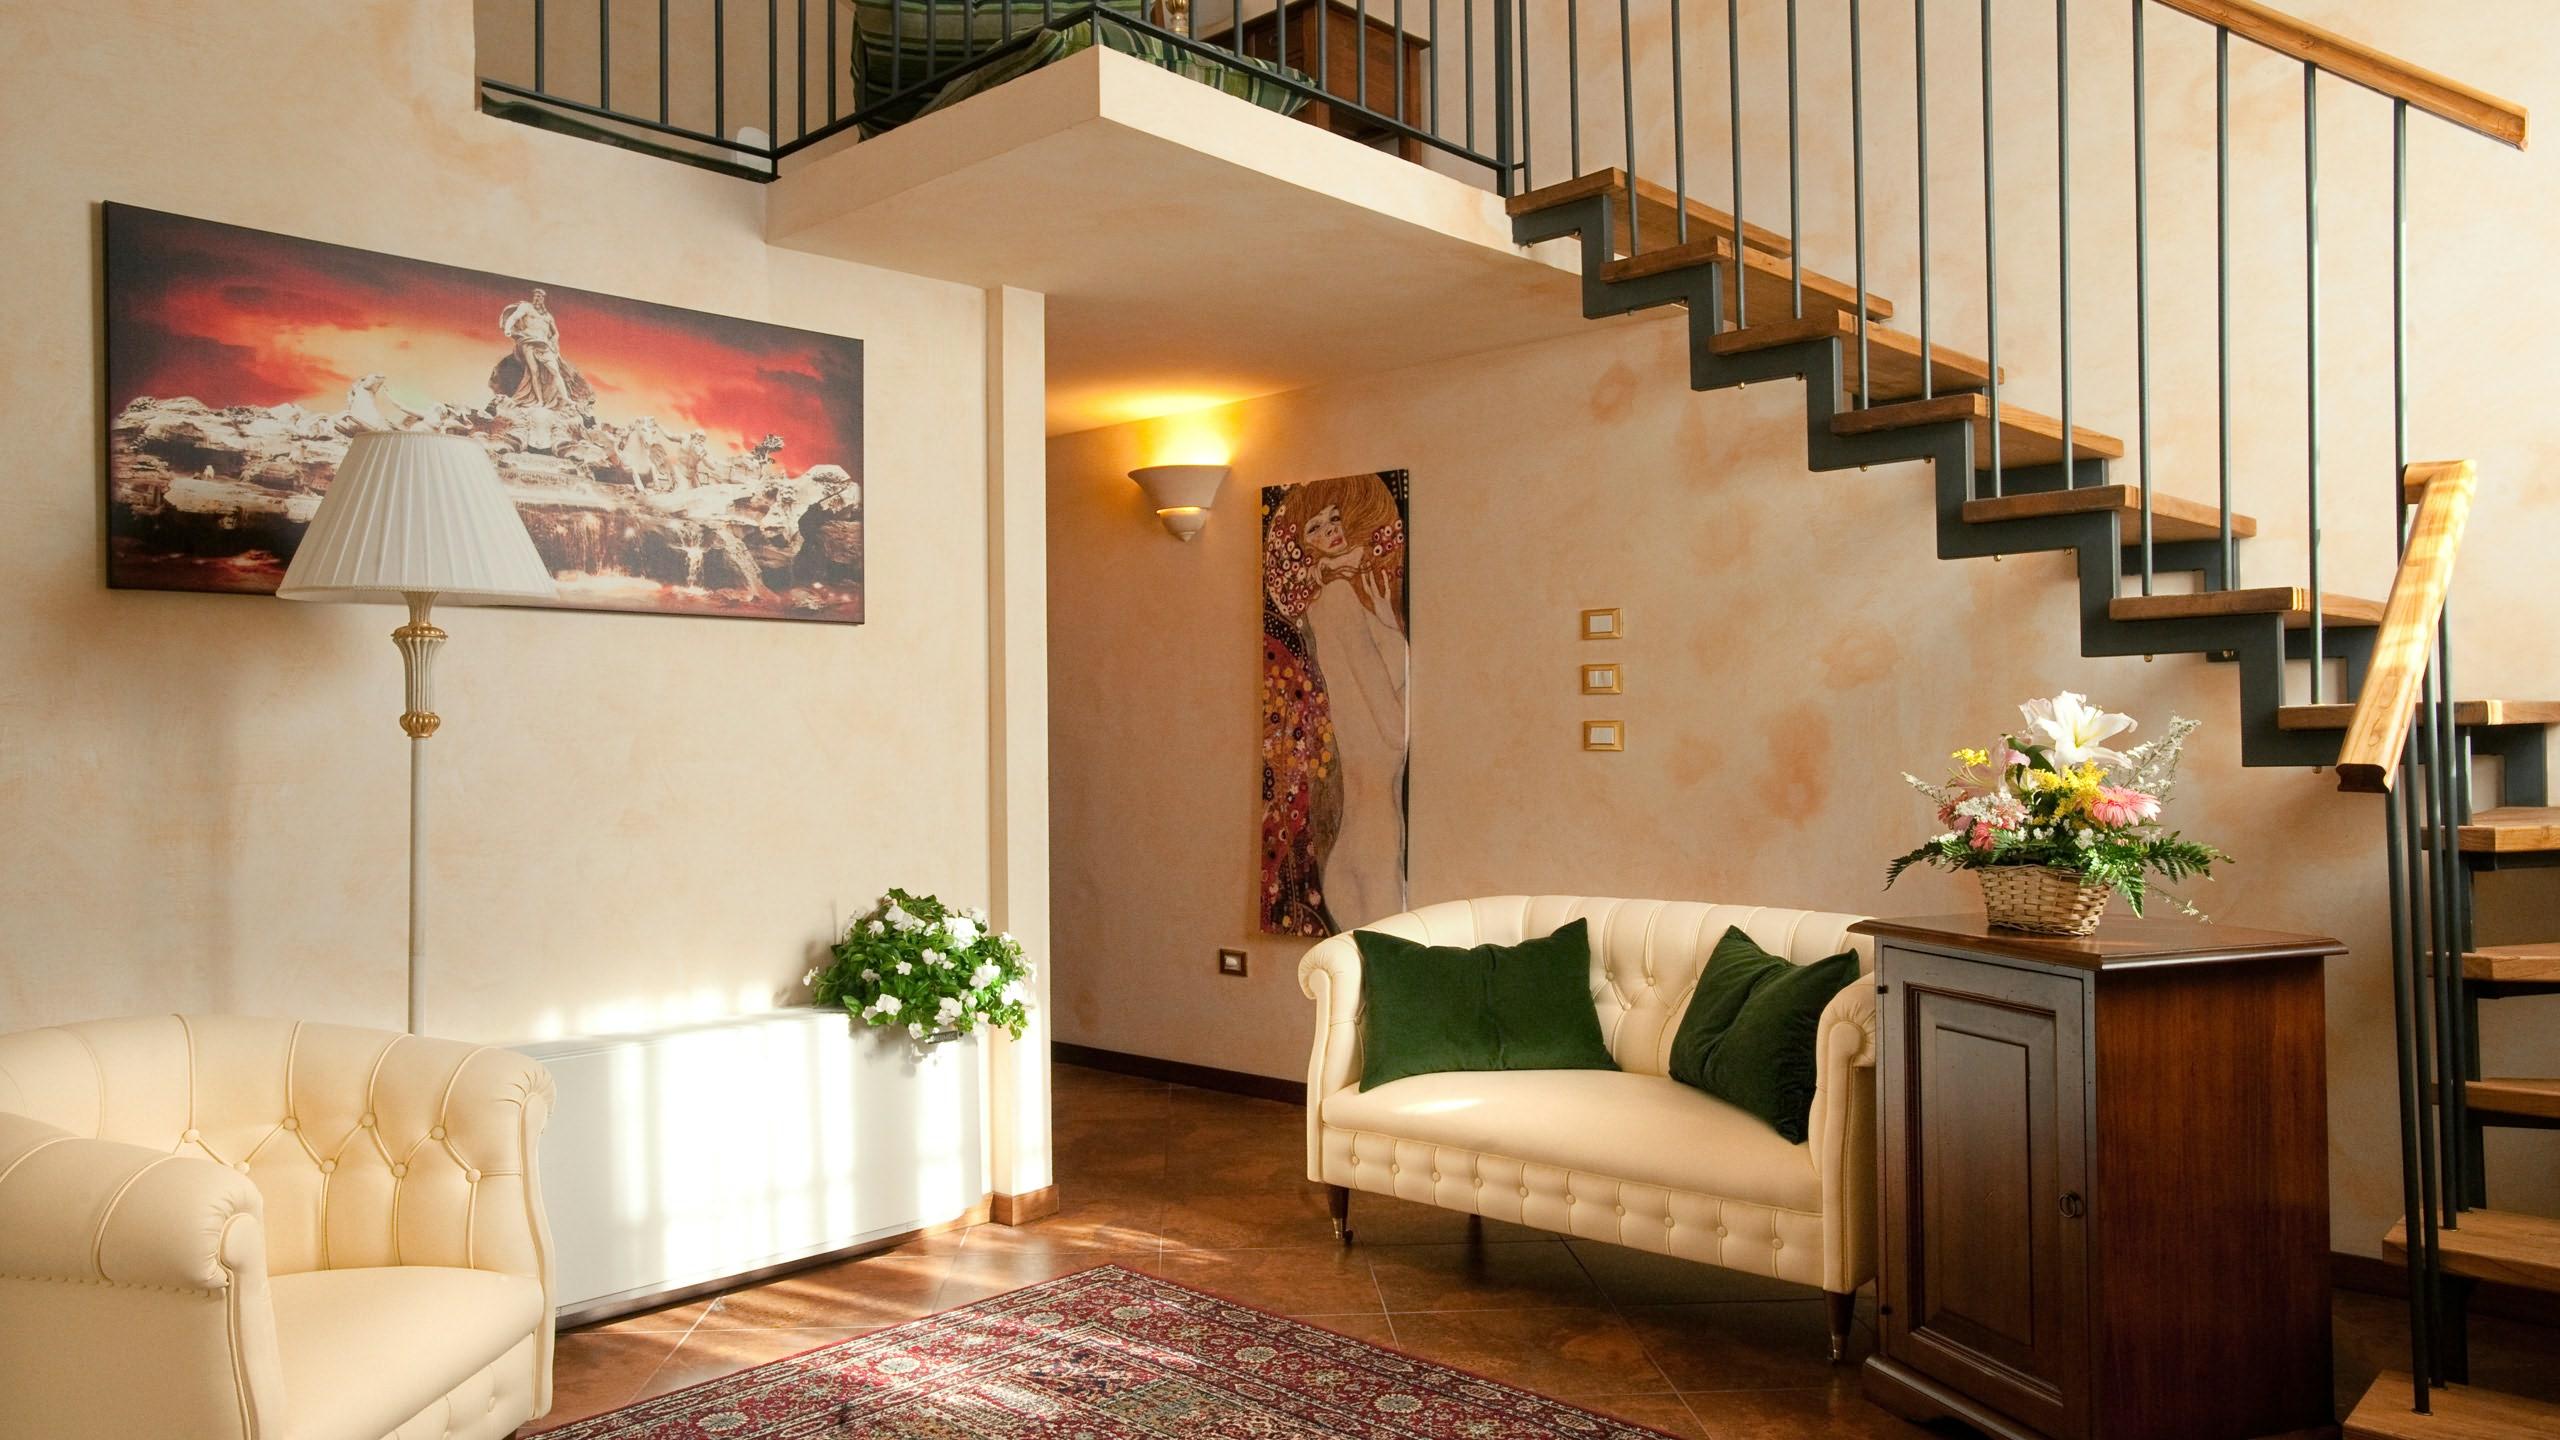 oc-casali-rome-rooms-004